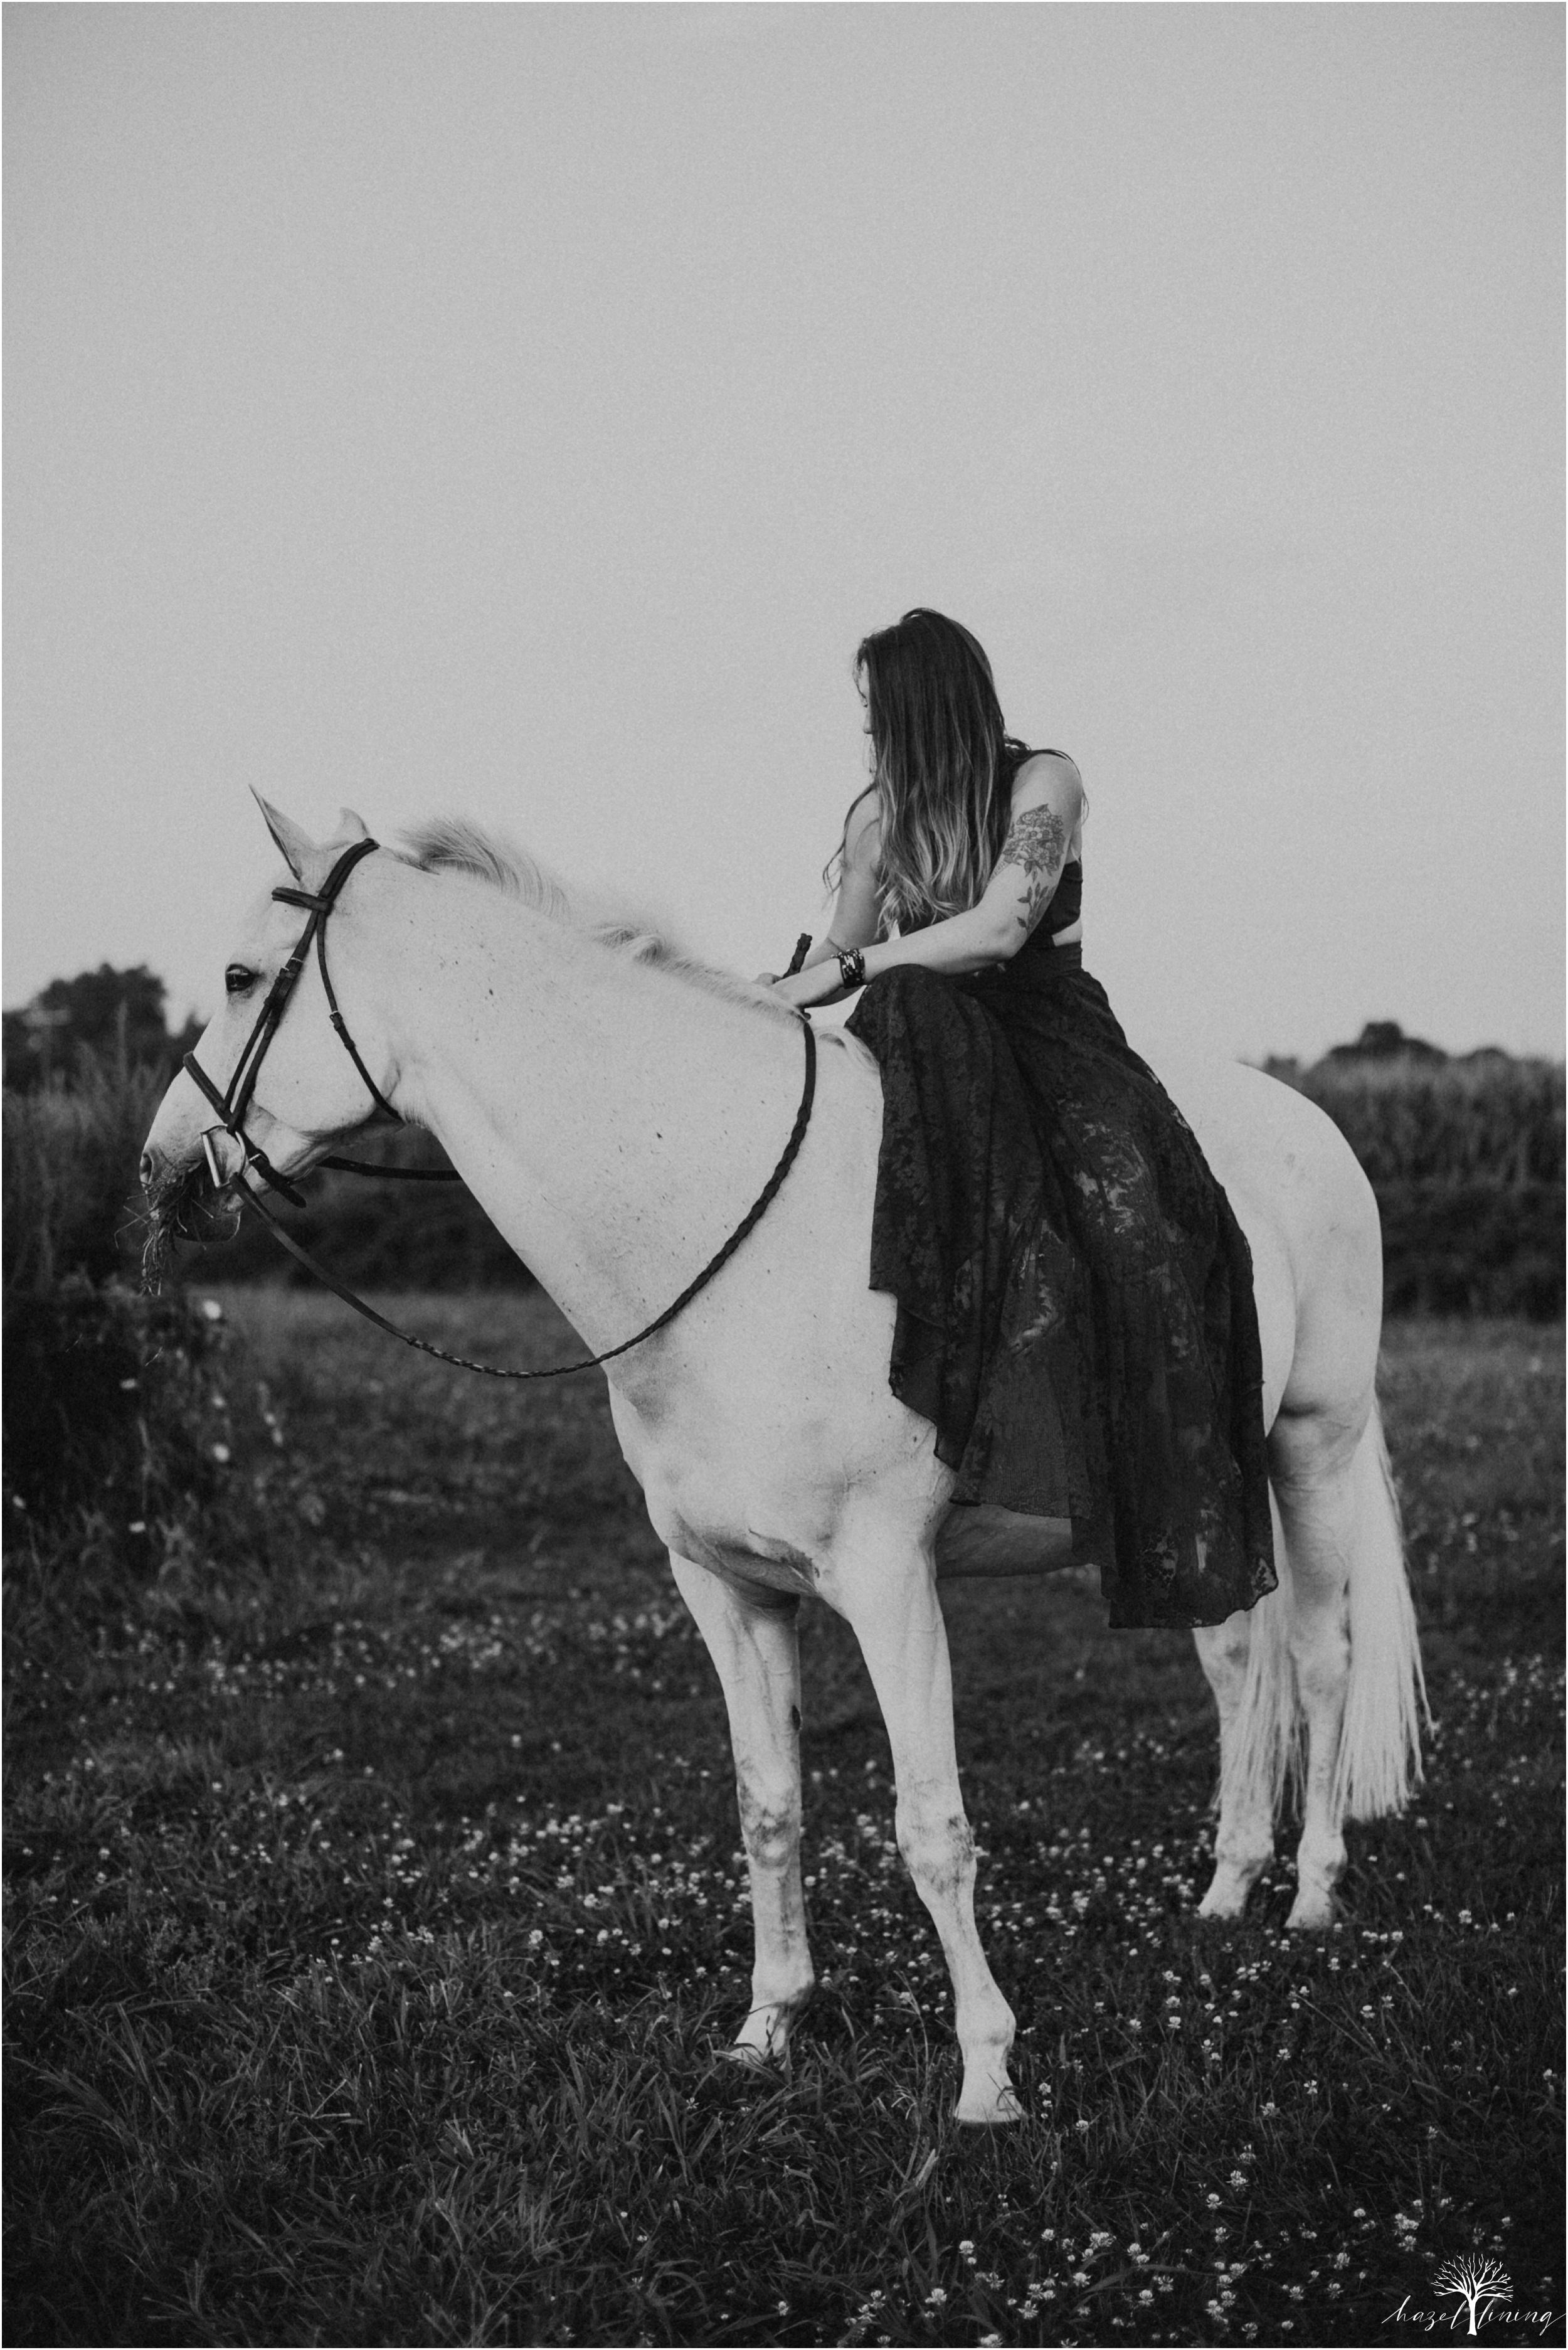 taylor-adams-and-horse-delaware-valley-university-delval-summer-equestrian-portrait-session-hazel-lining-photography-destination-elopement-wedding-engagement-photography_0054.jpg